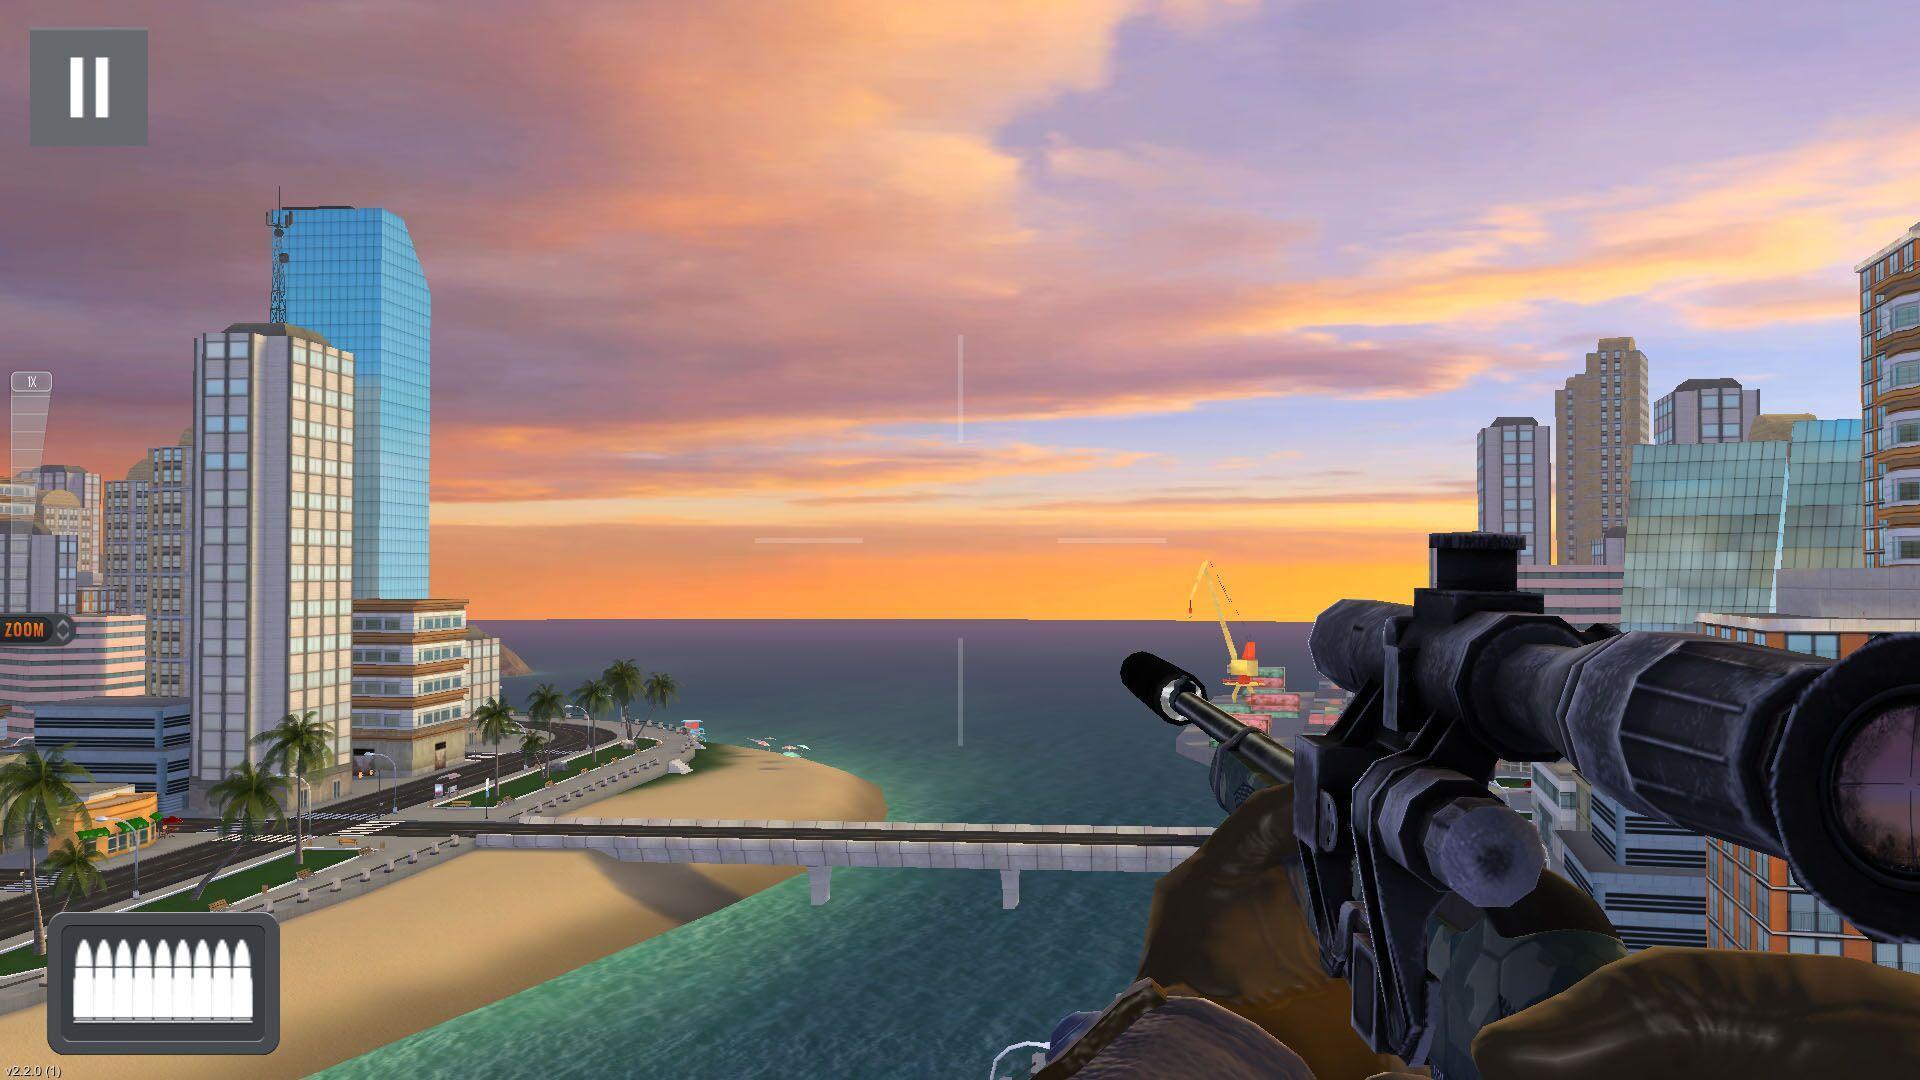 Sniper 3D Fun Free Online FPS Shooting Game 3.15.1 Screenshot 8